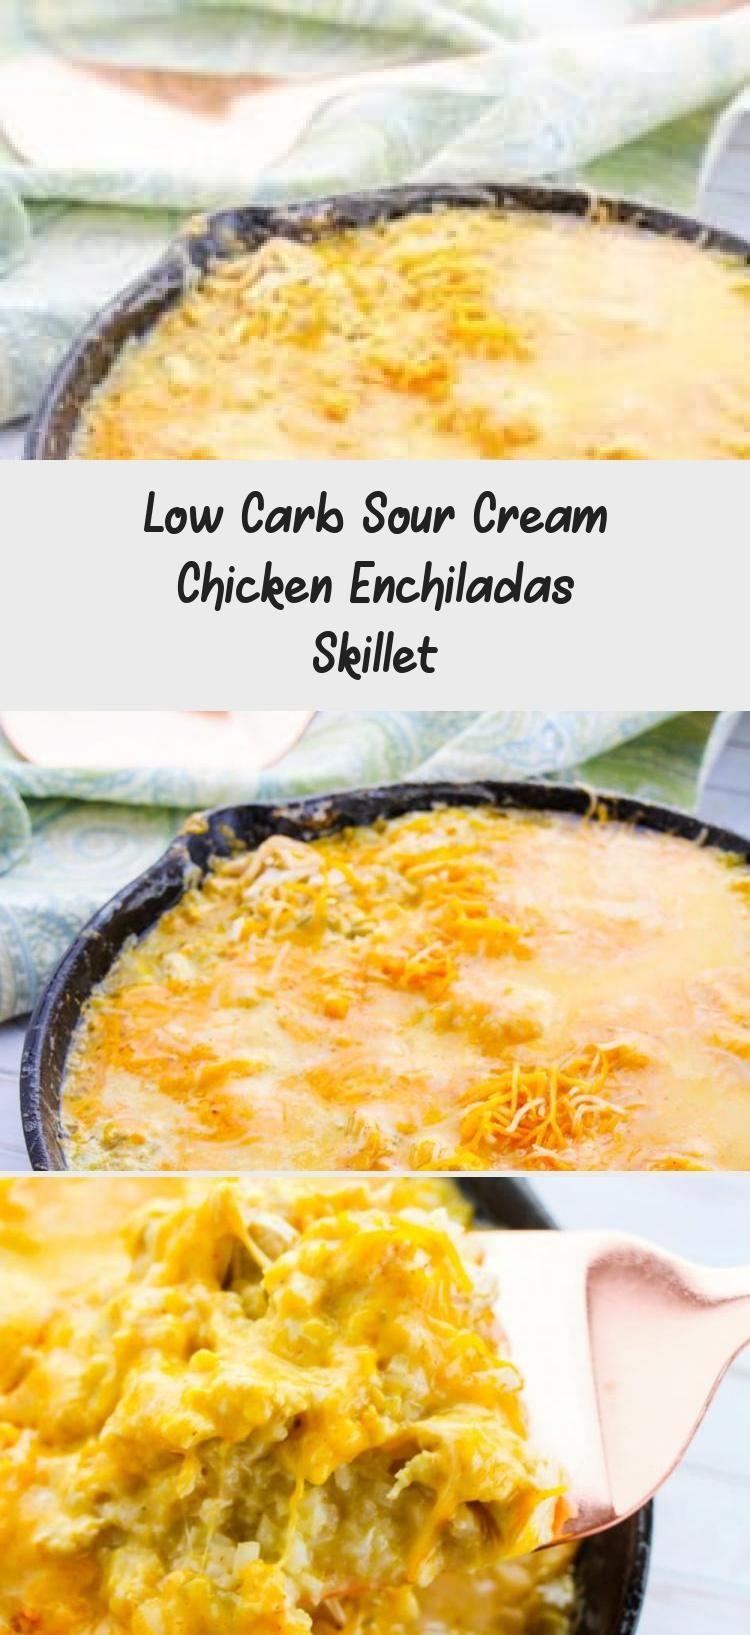 Low Carb Sour Cream Chicken Enchiladas Skillet En 2020